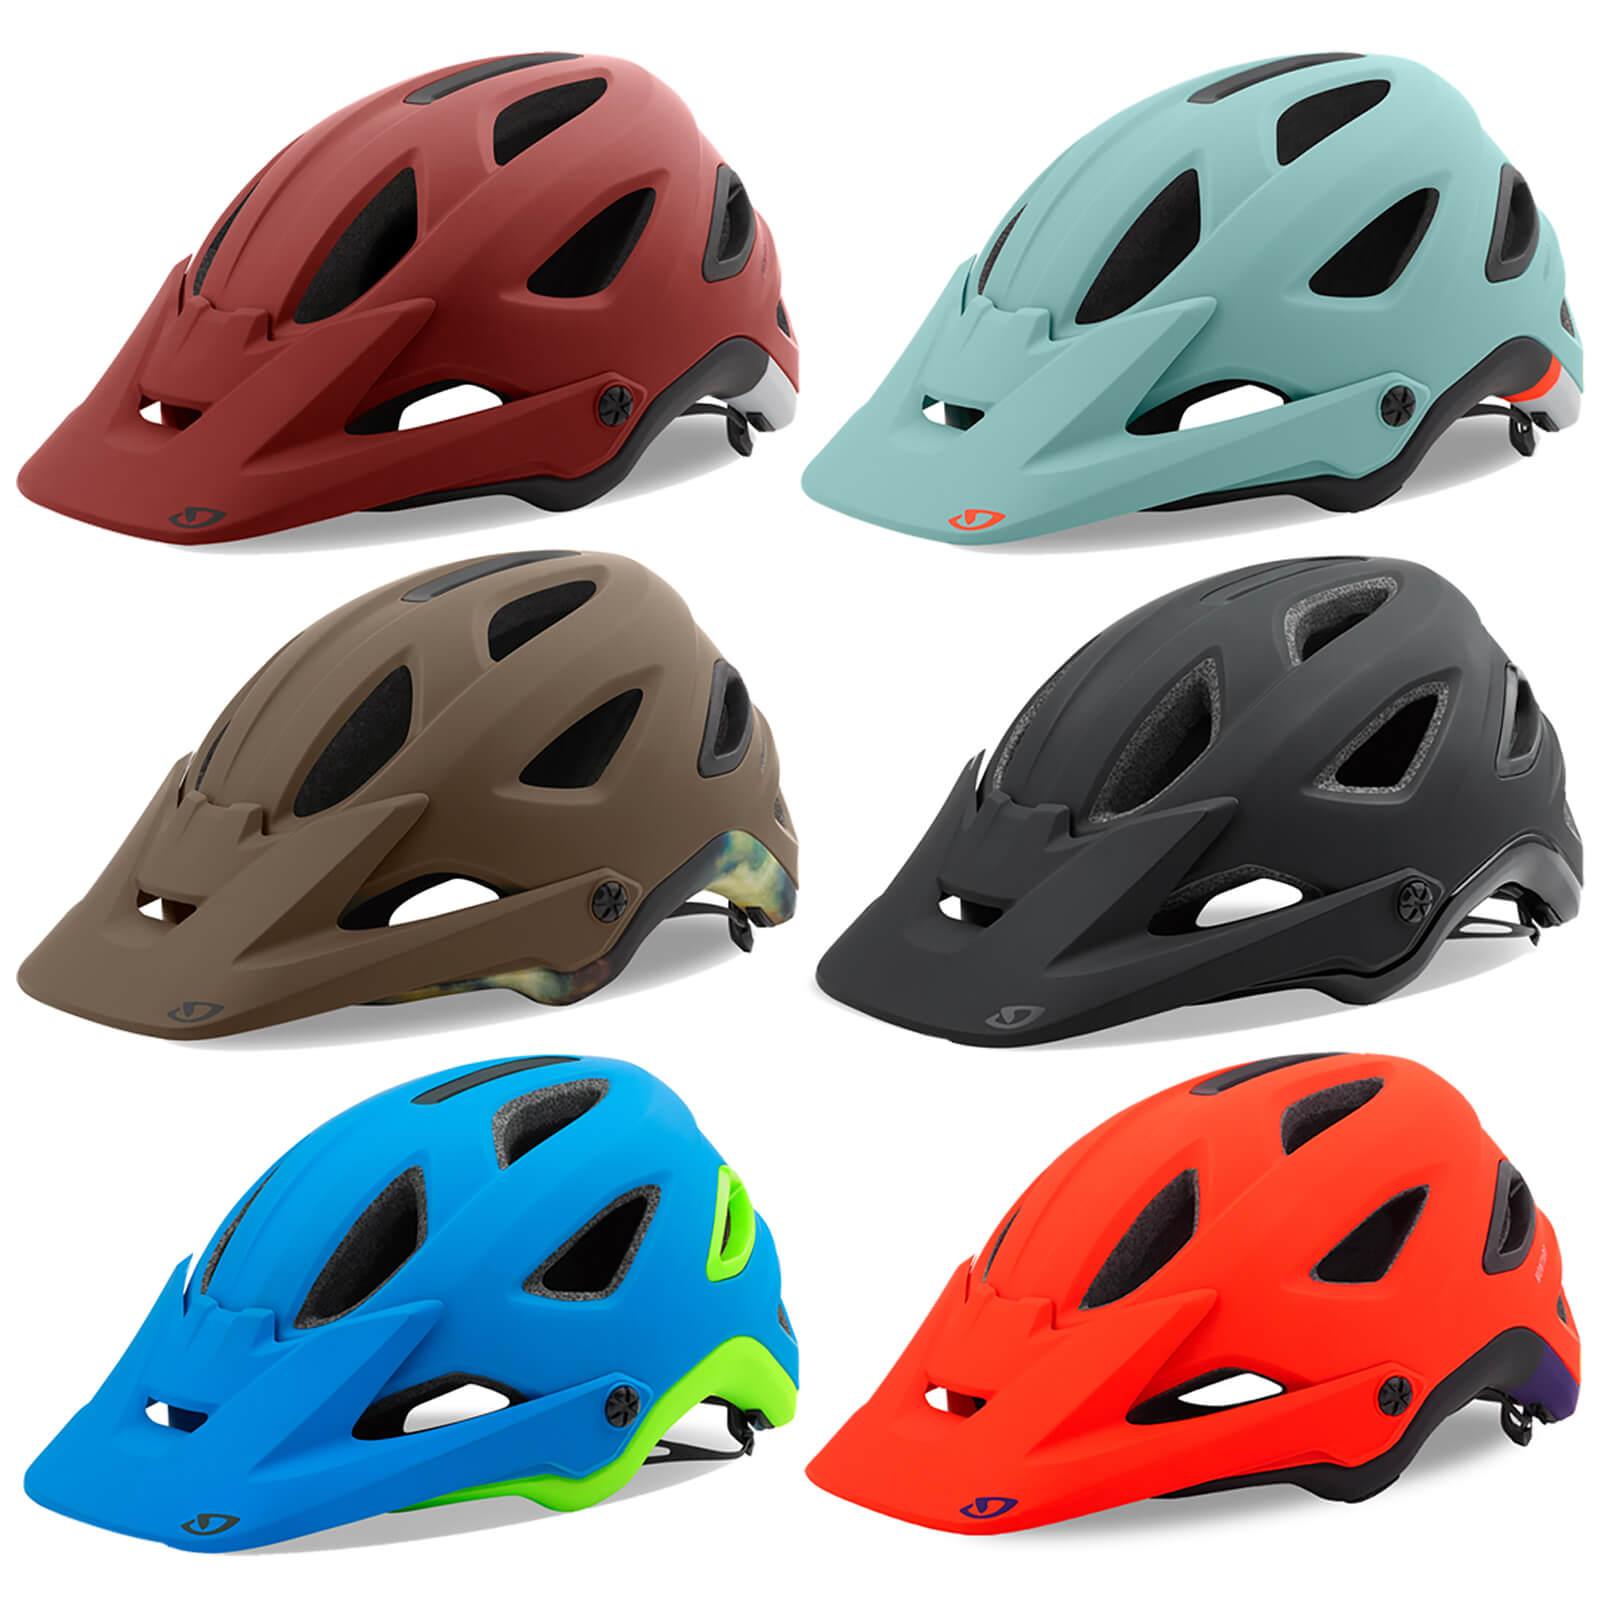 498610fef45 Giro Montaro MIPS MTB Helmet - 2019 | ProBikeKit UK